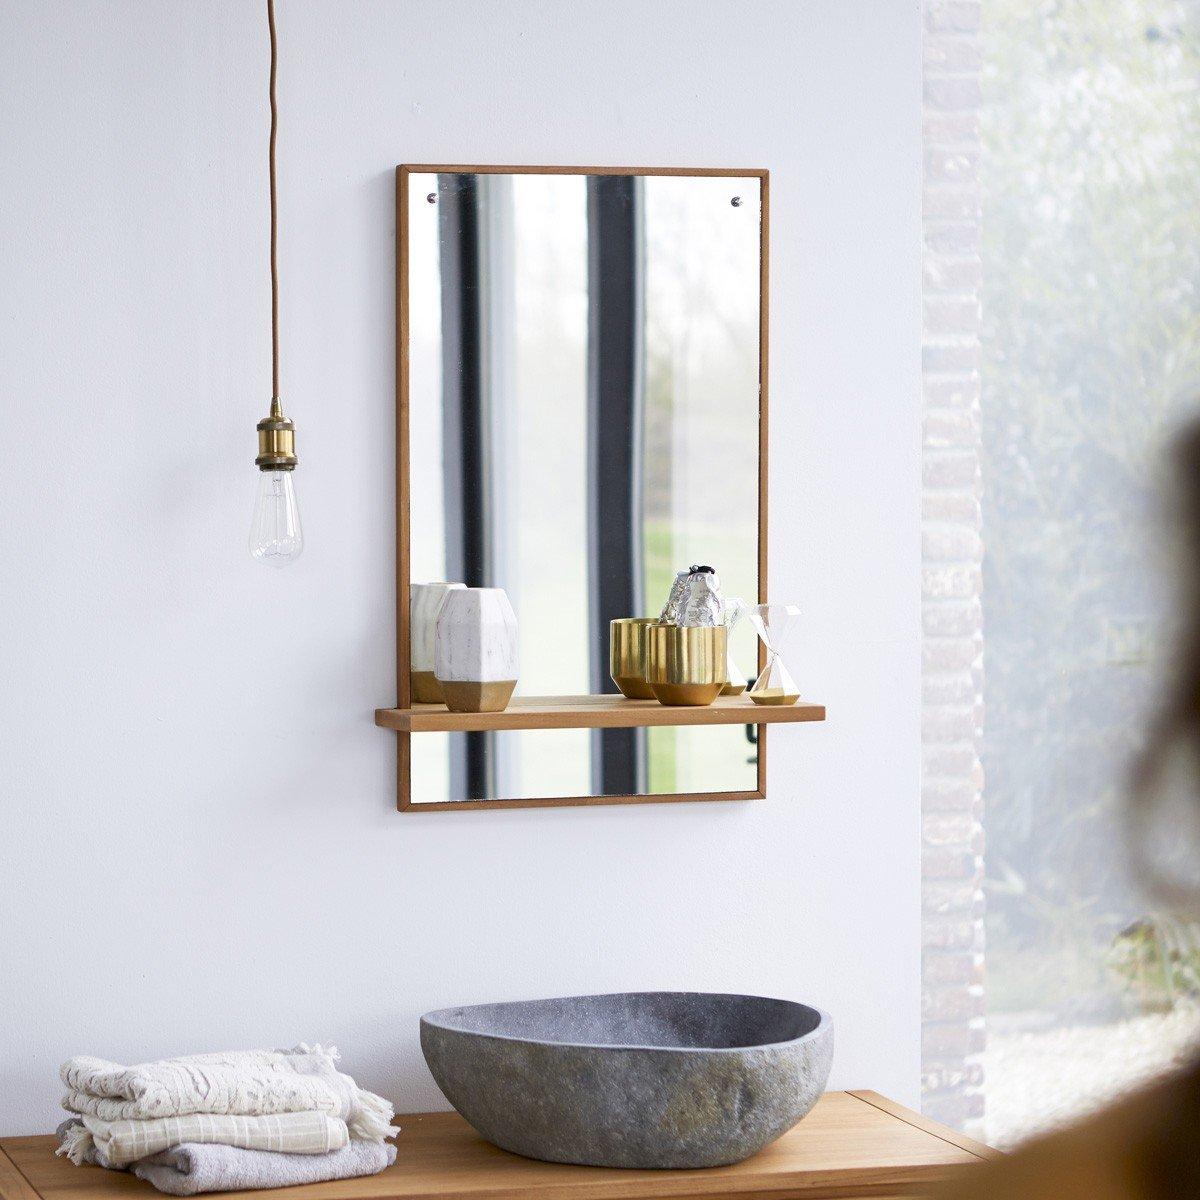 Tikamoon Galyno Miroir - Teck - Beige - 50 x 15 x 75 cm